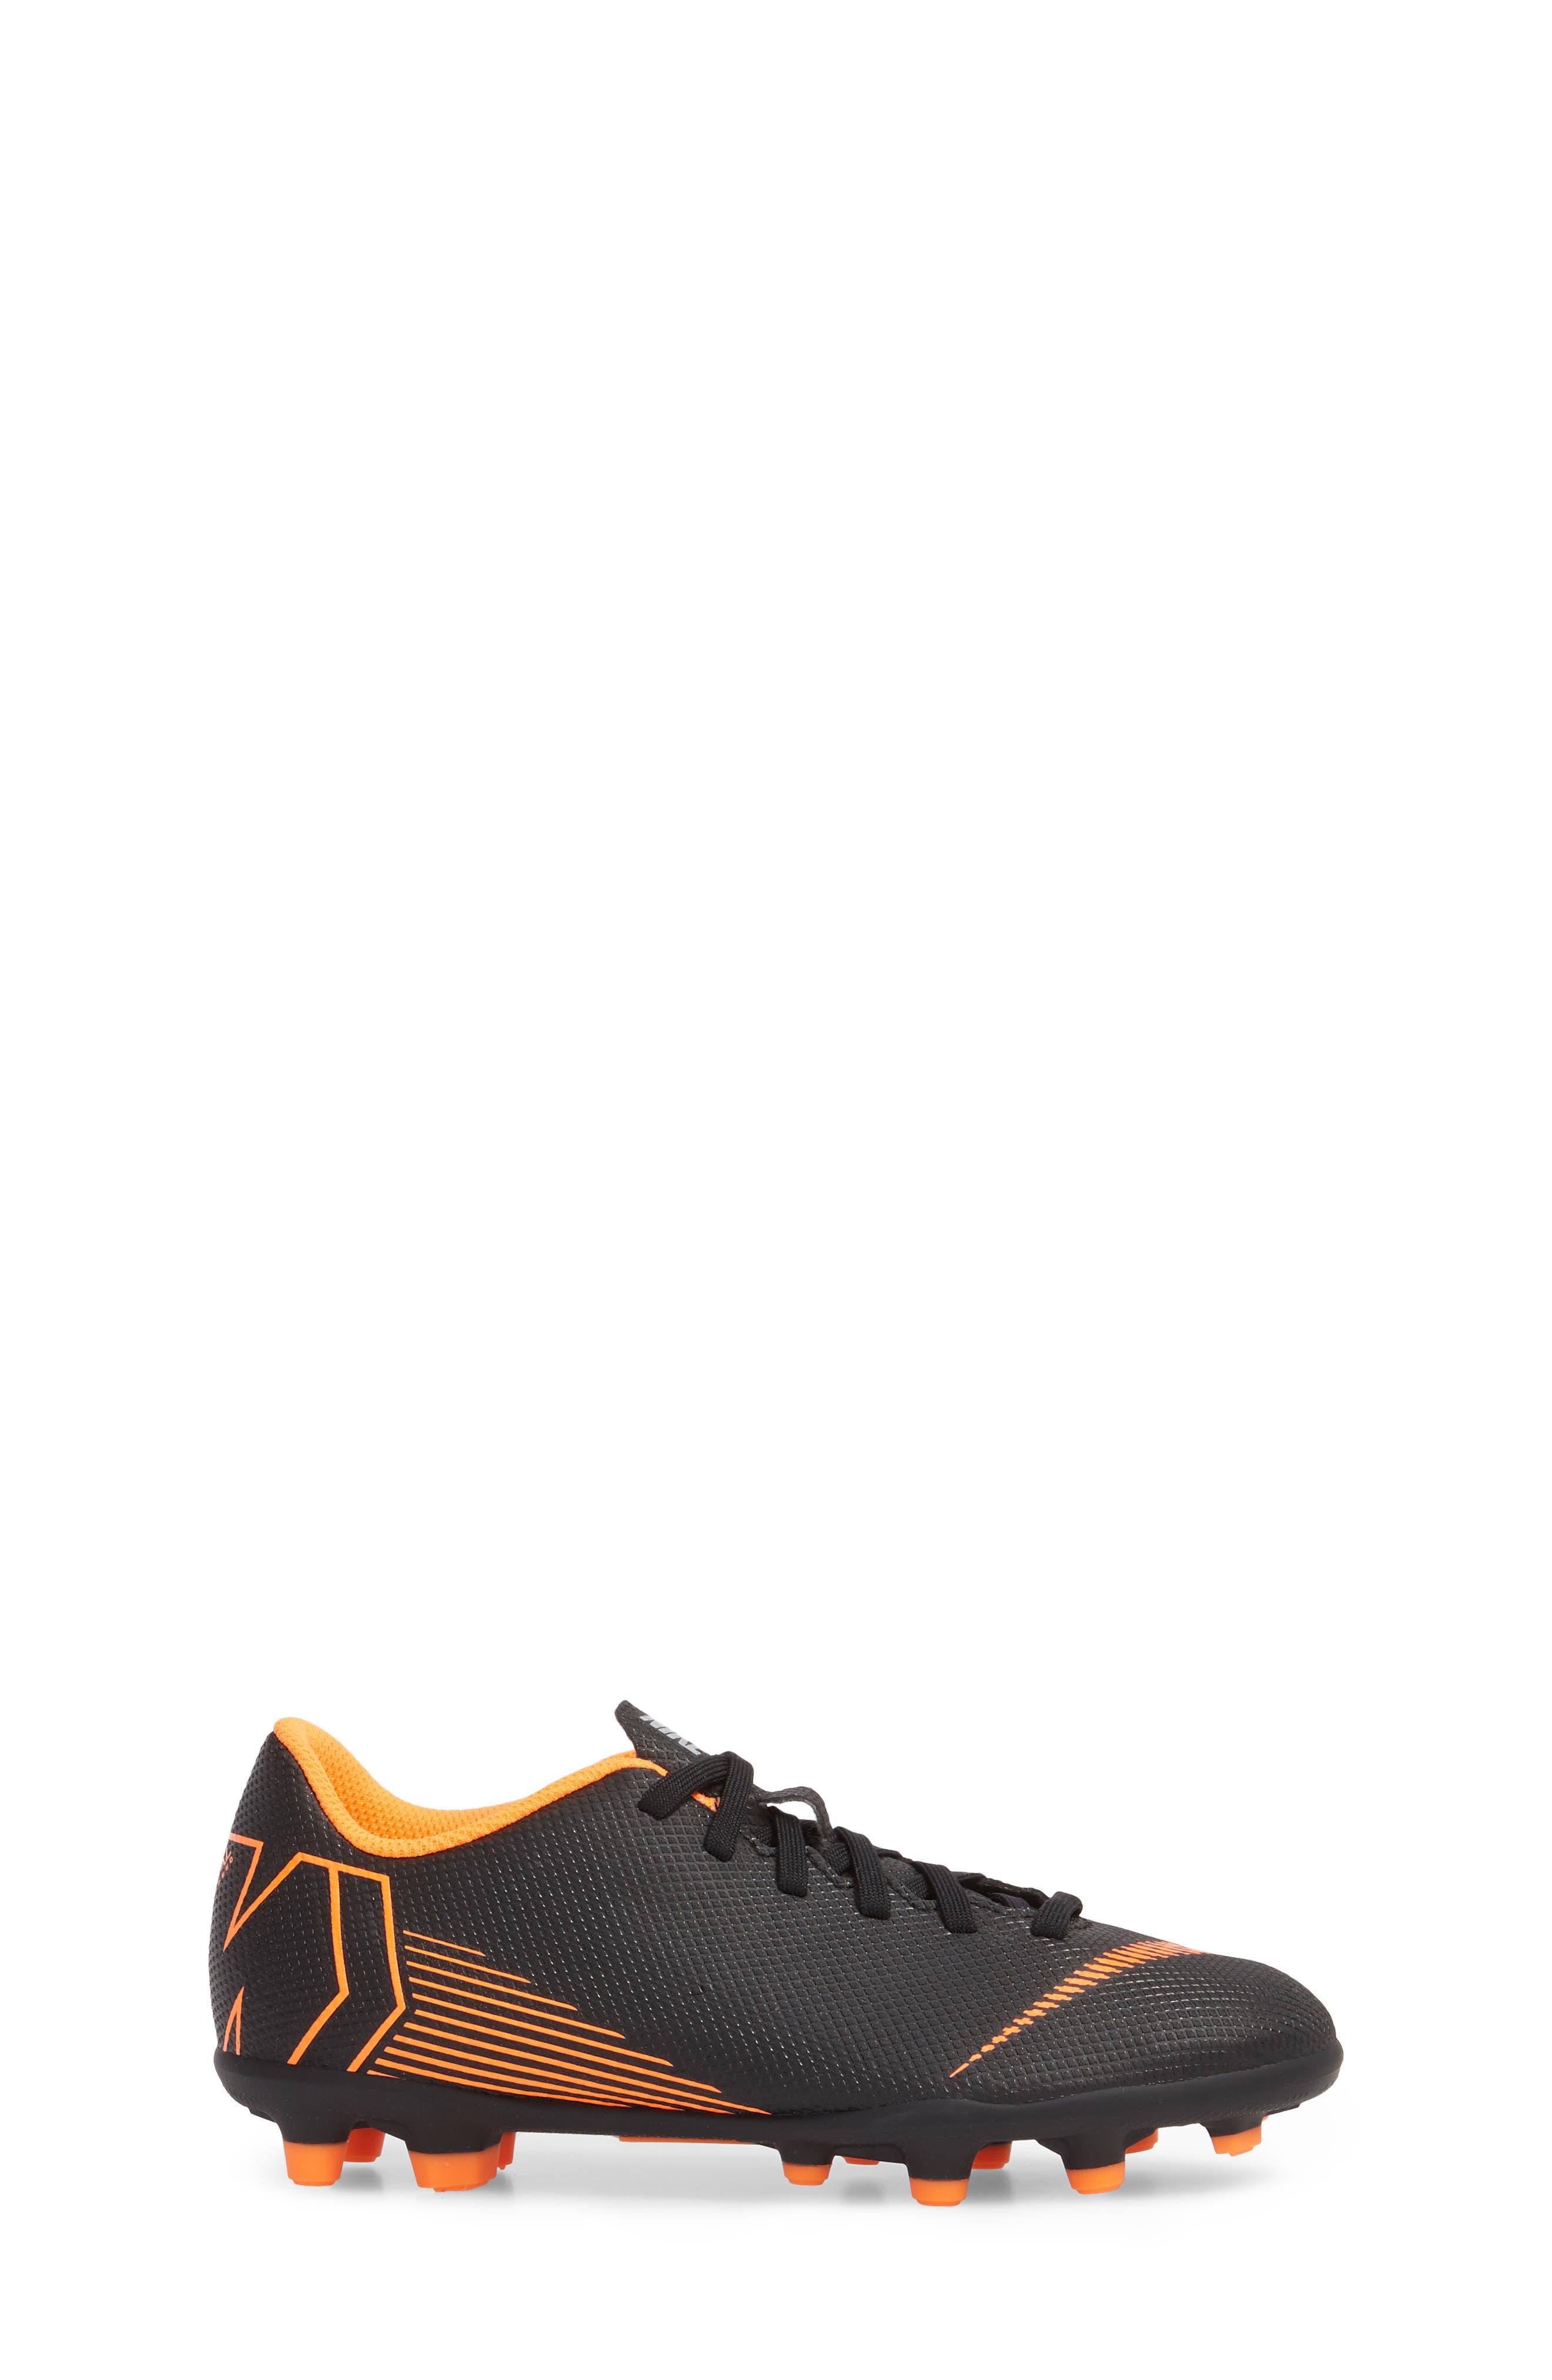 Vapor XII Club Multi Ground Soccer Shoe,                             Alternate thumbnail 3, color,                             Black/ Total Orange/ White